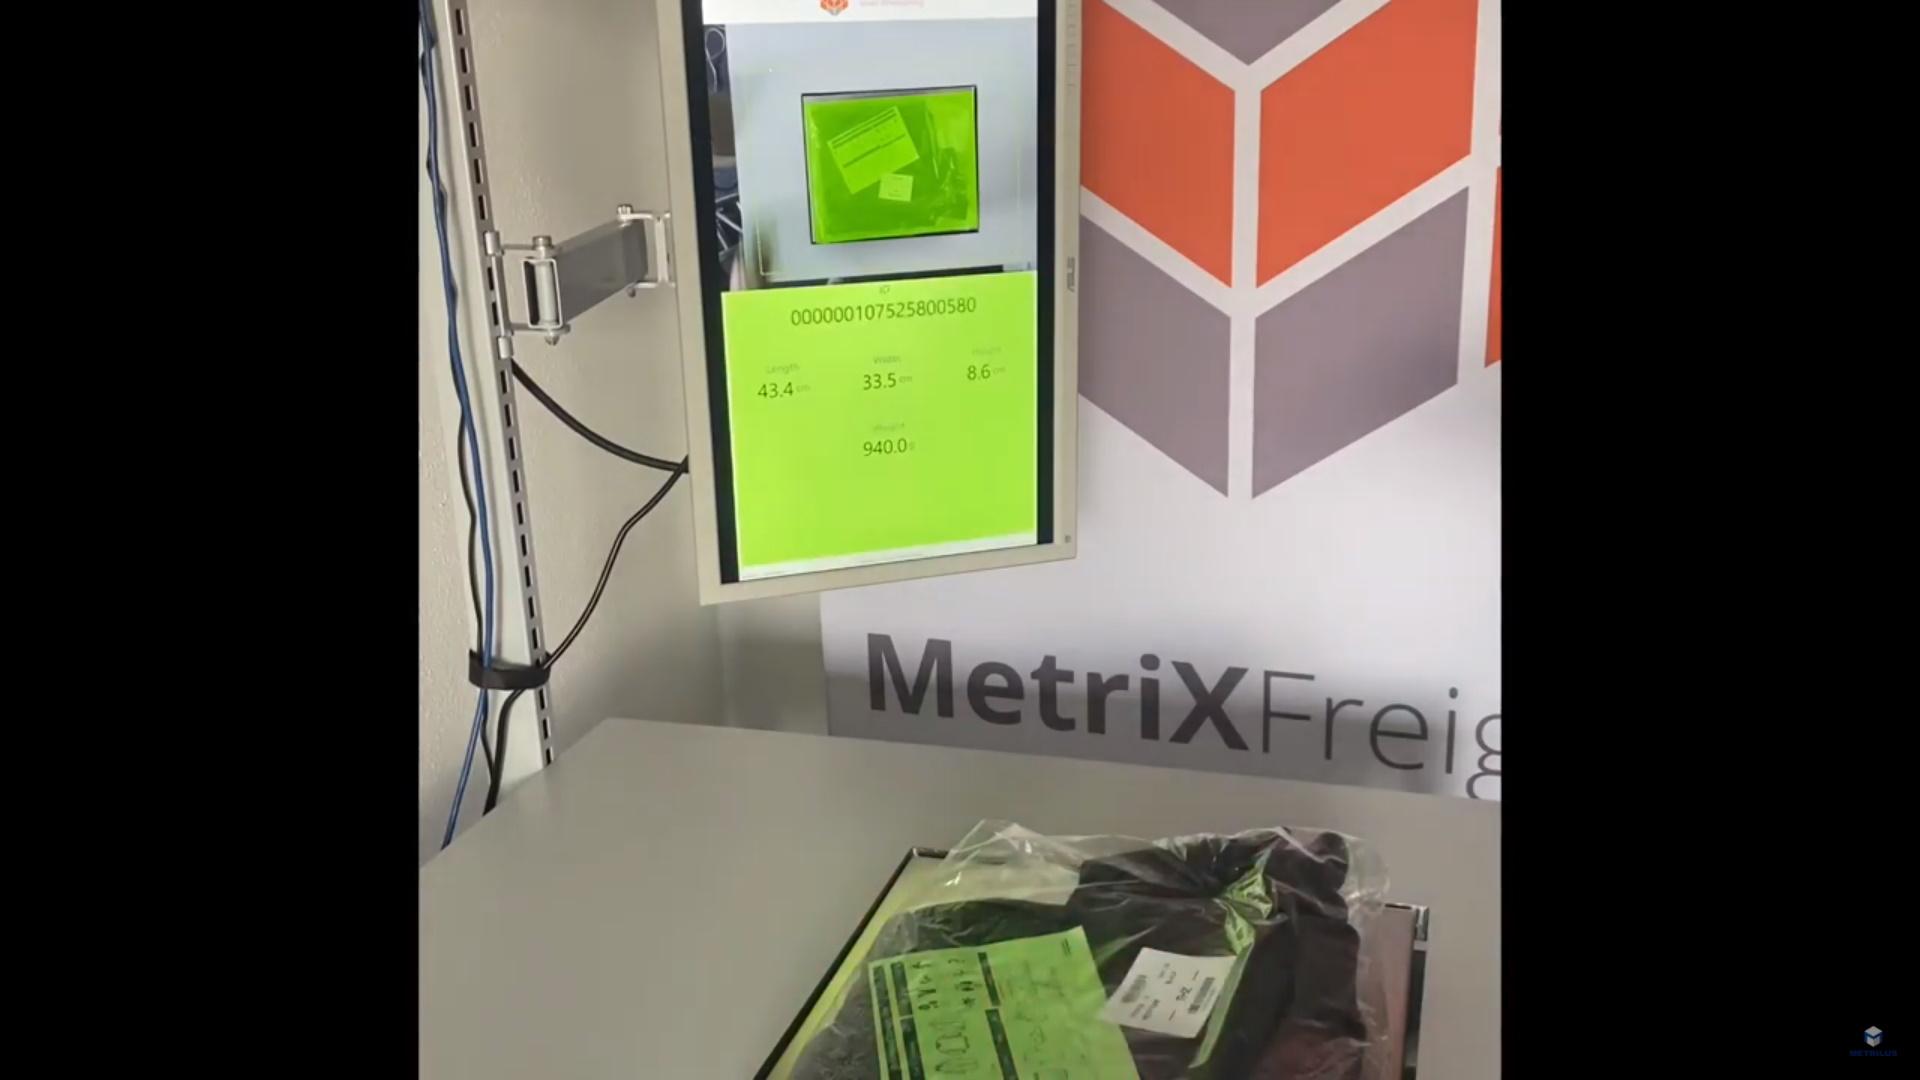 MetriXFreight S 110 - Textile Example